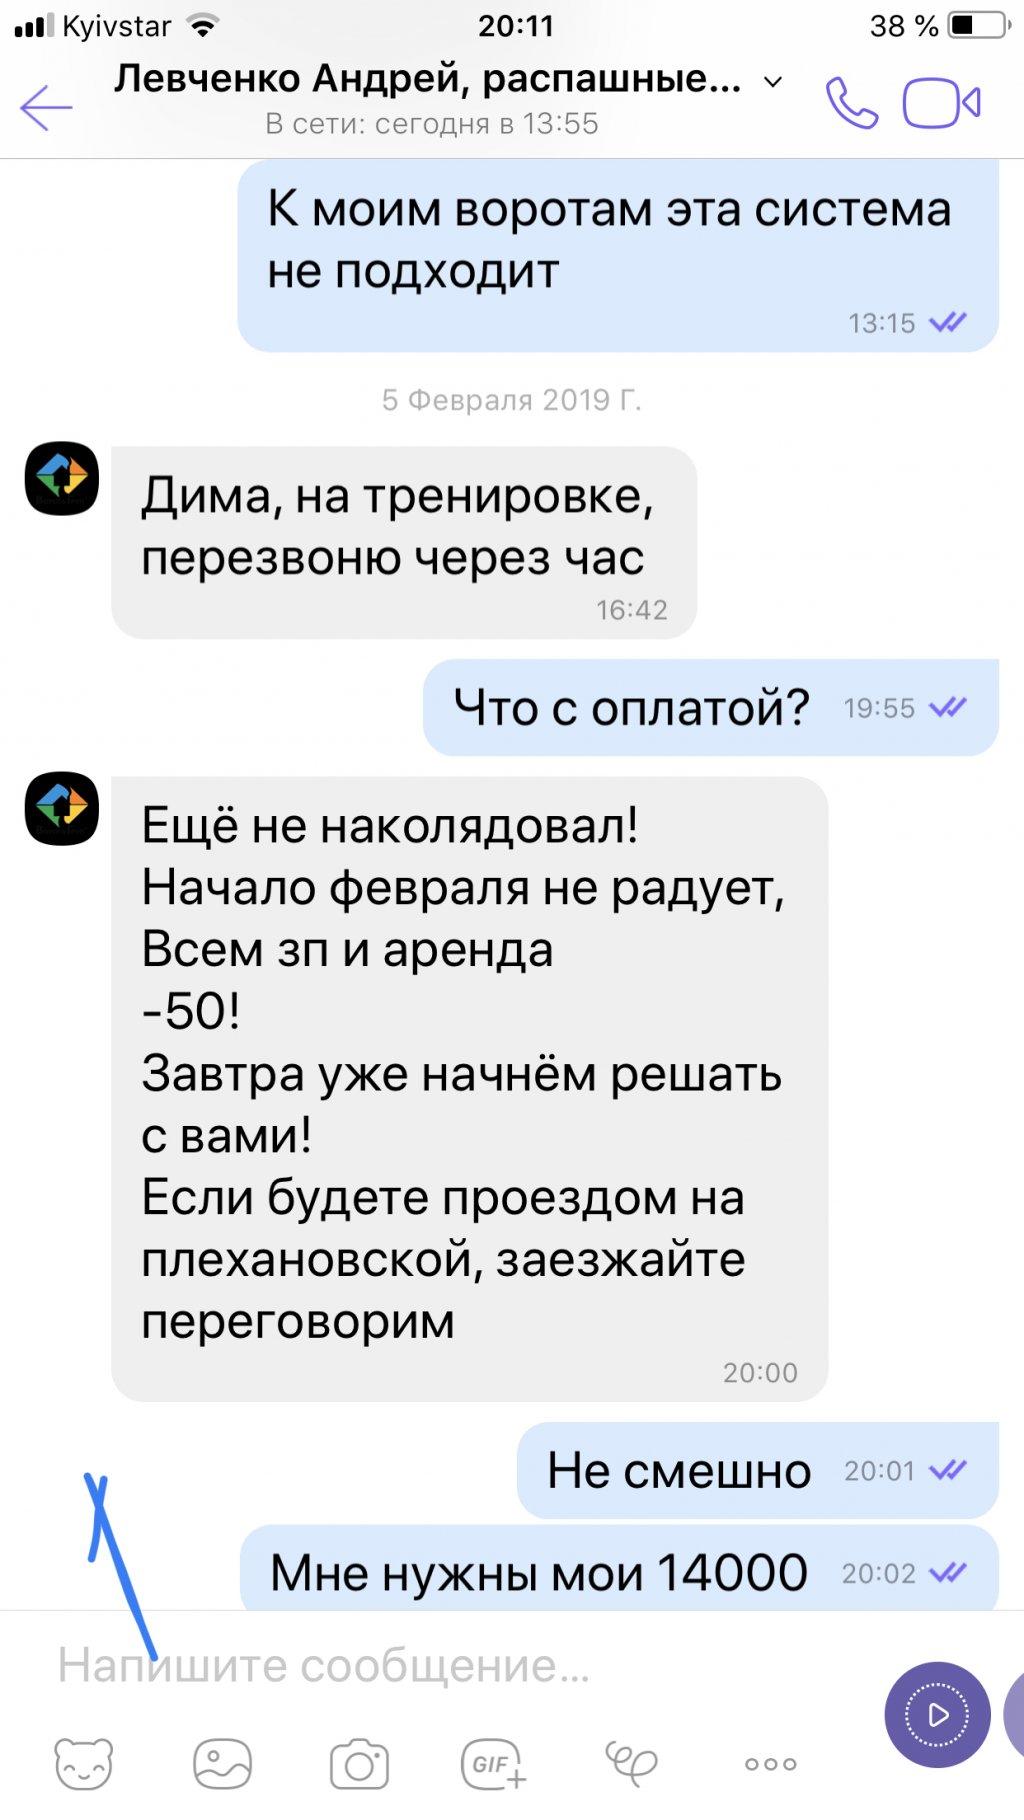 Ворота групп - Флп Левченко Андрей Васильевич